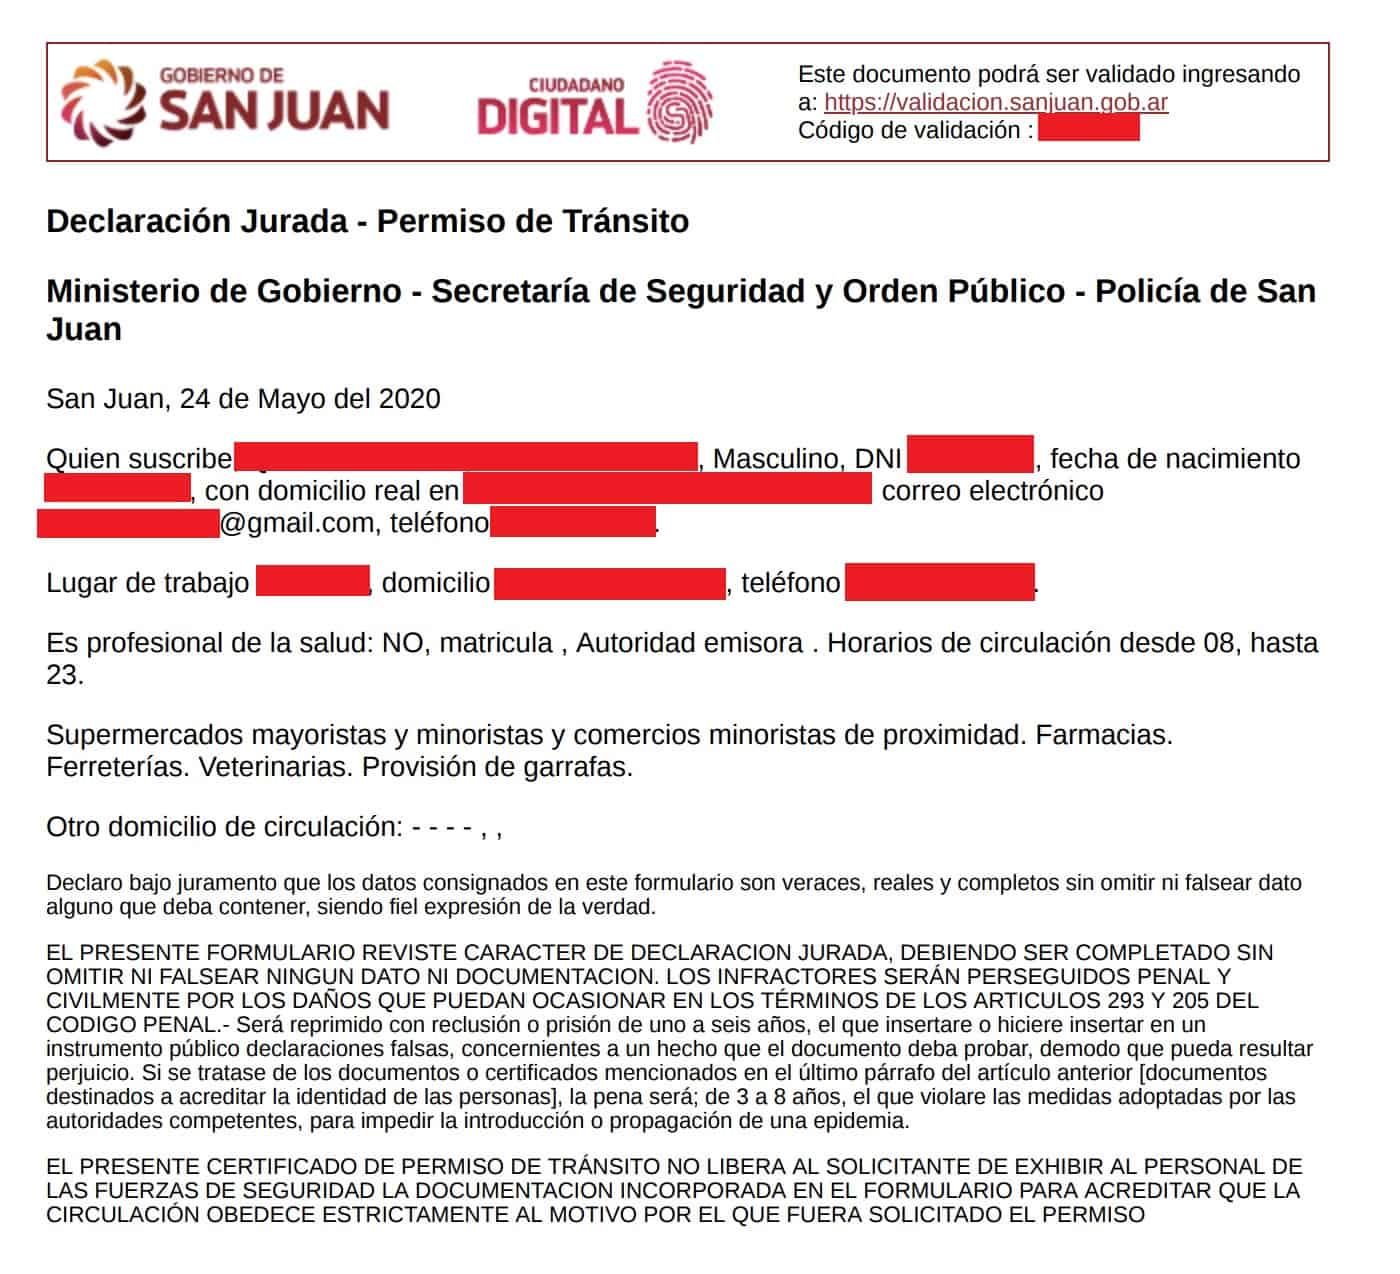 argentina covid-19 circulation permit